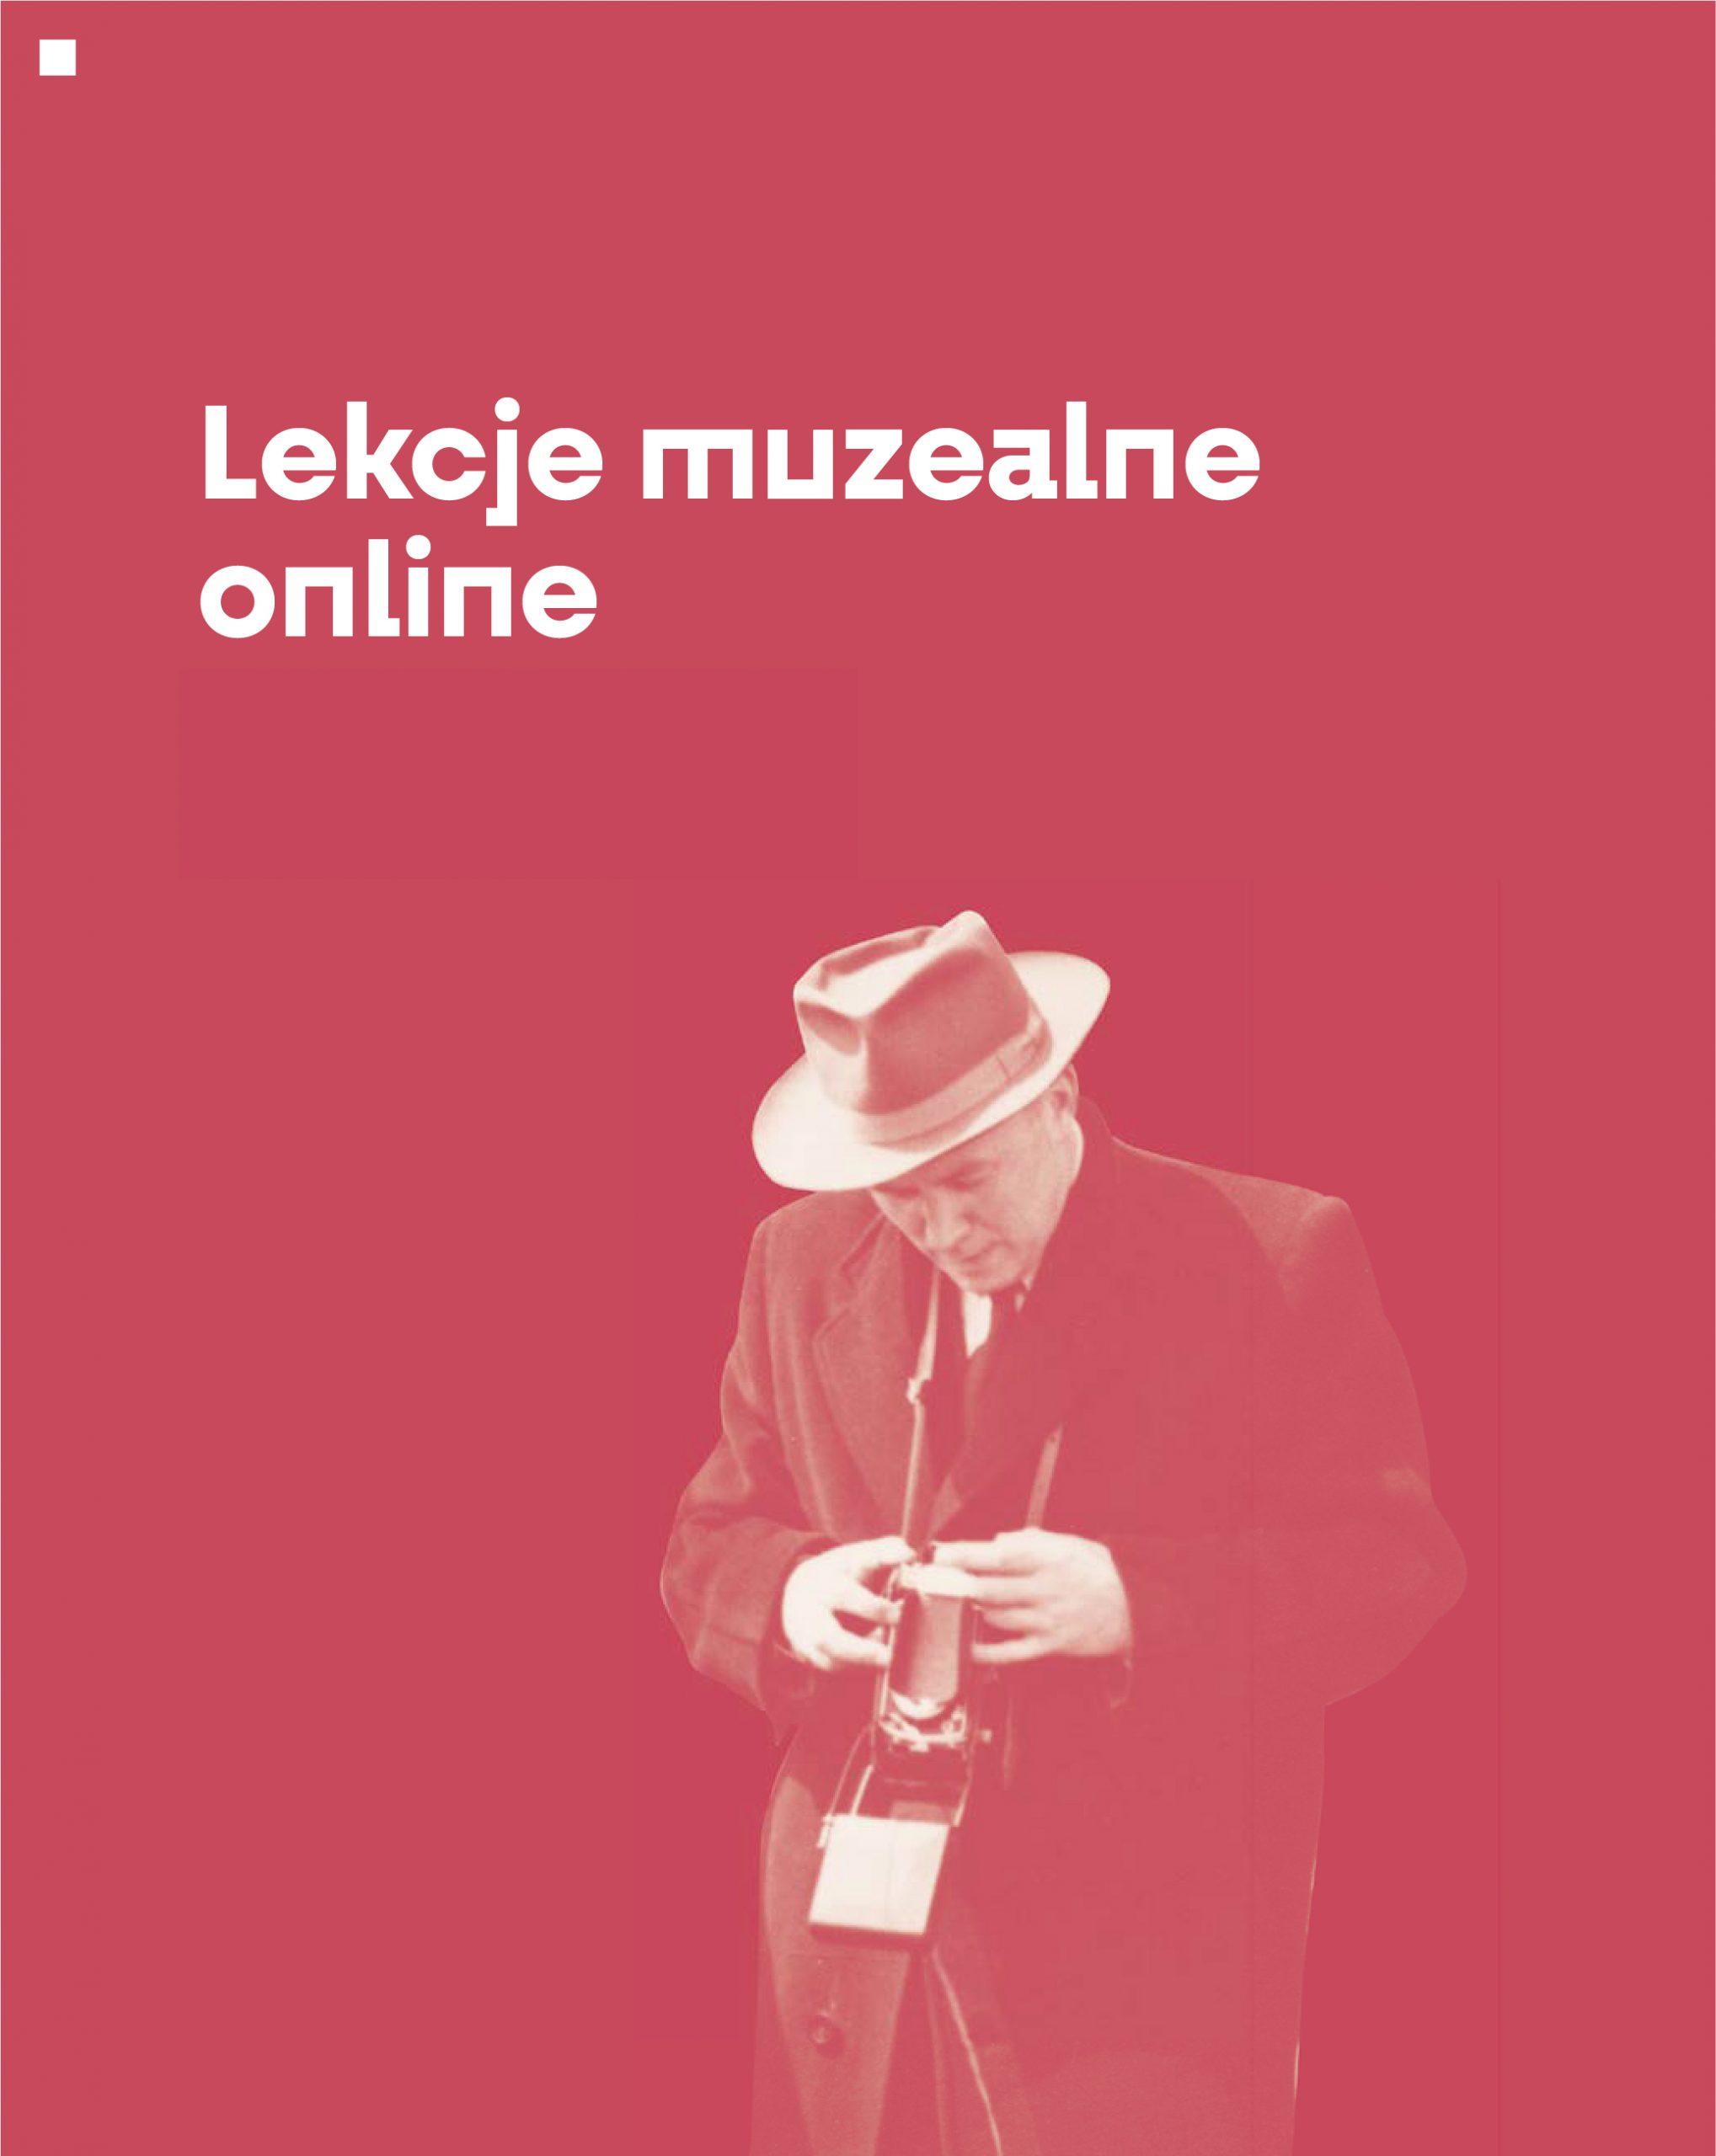 Lekcje muzealne online MPT 2020-09